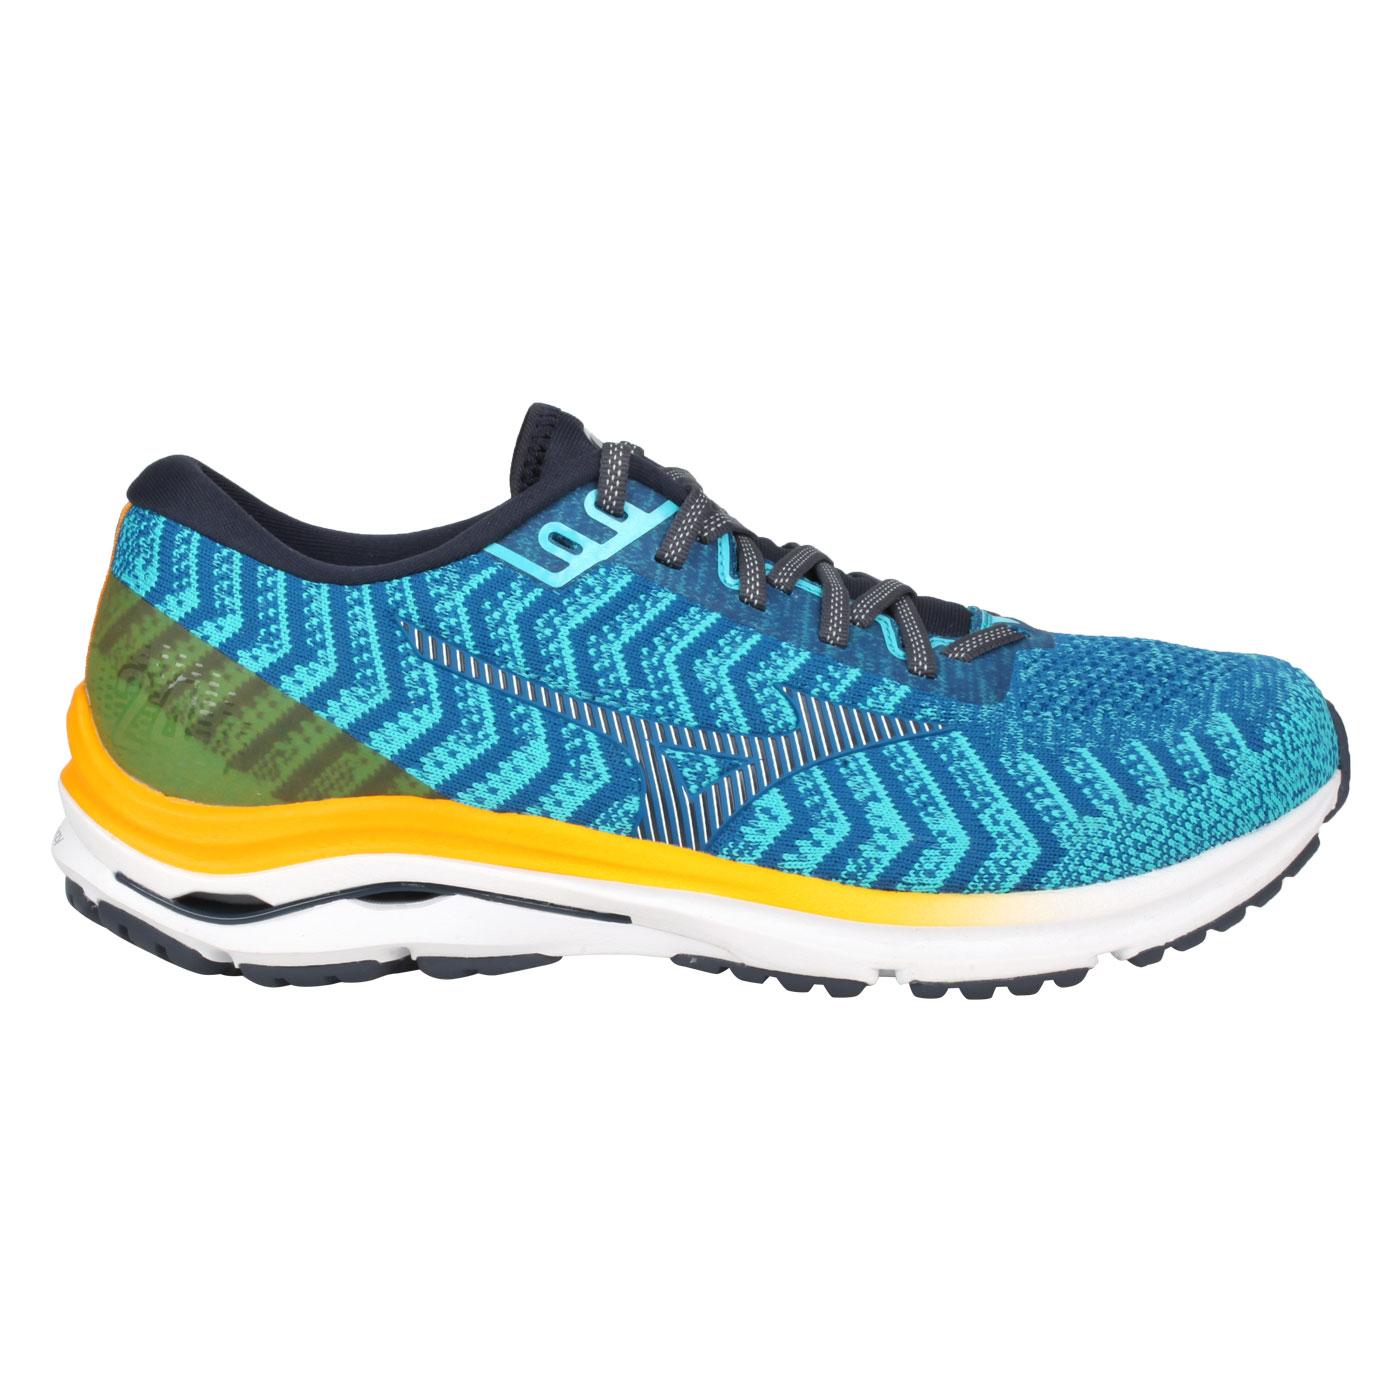 MIZUNO 男款慢跑鞋-4E  @WAVE RIDER 24 WAVEKNIT SW@J1GC207630 - 藍黃